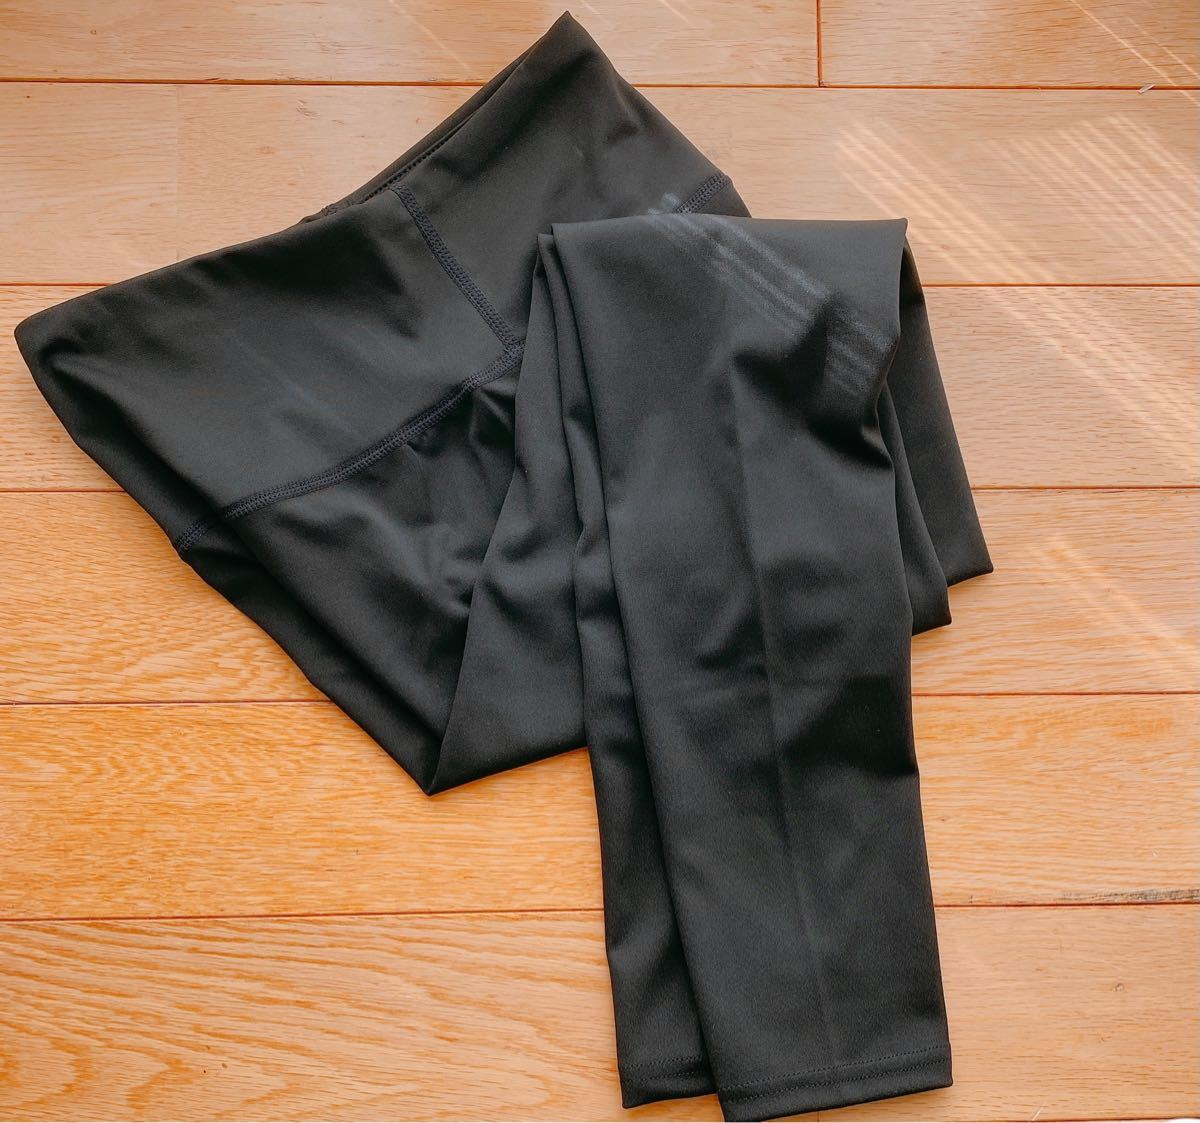 M ブラック ヨガ パンツ レディース レギンス 10分丈 スポーツ ヨガウェア